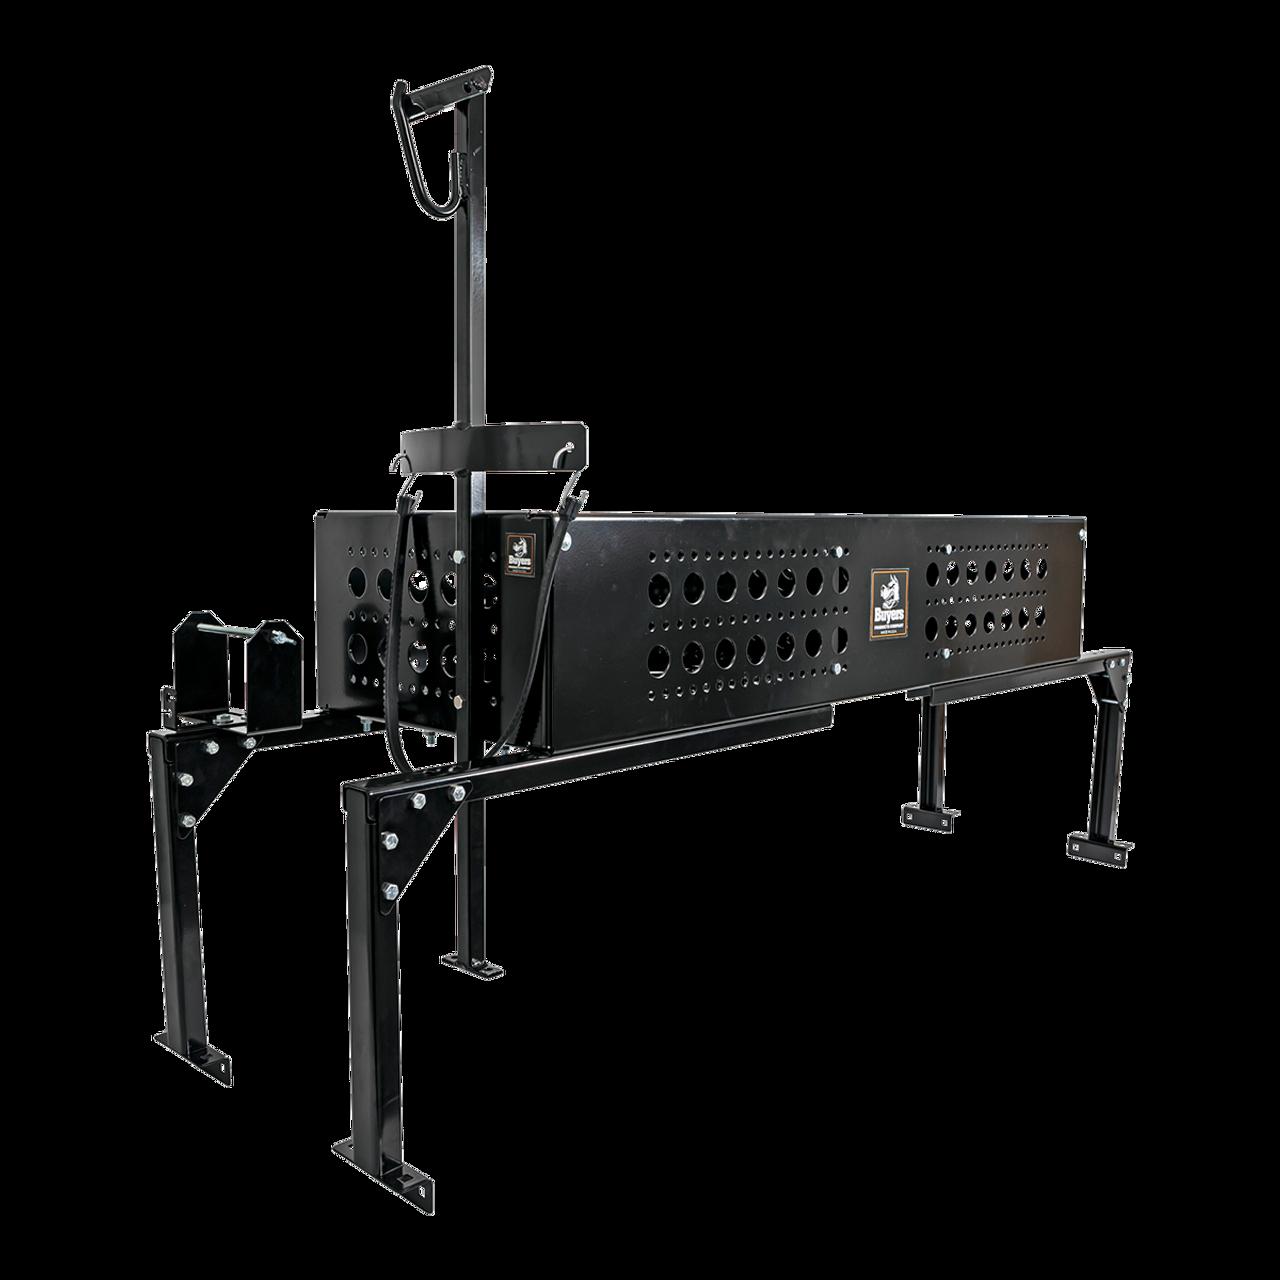 LT45 --- Multi-Purpose Storage Basket